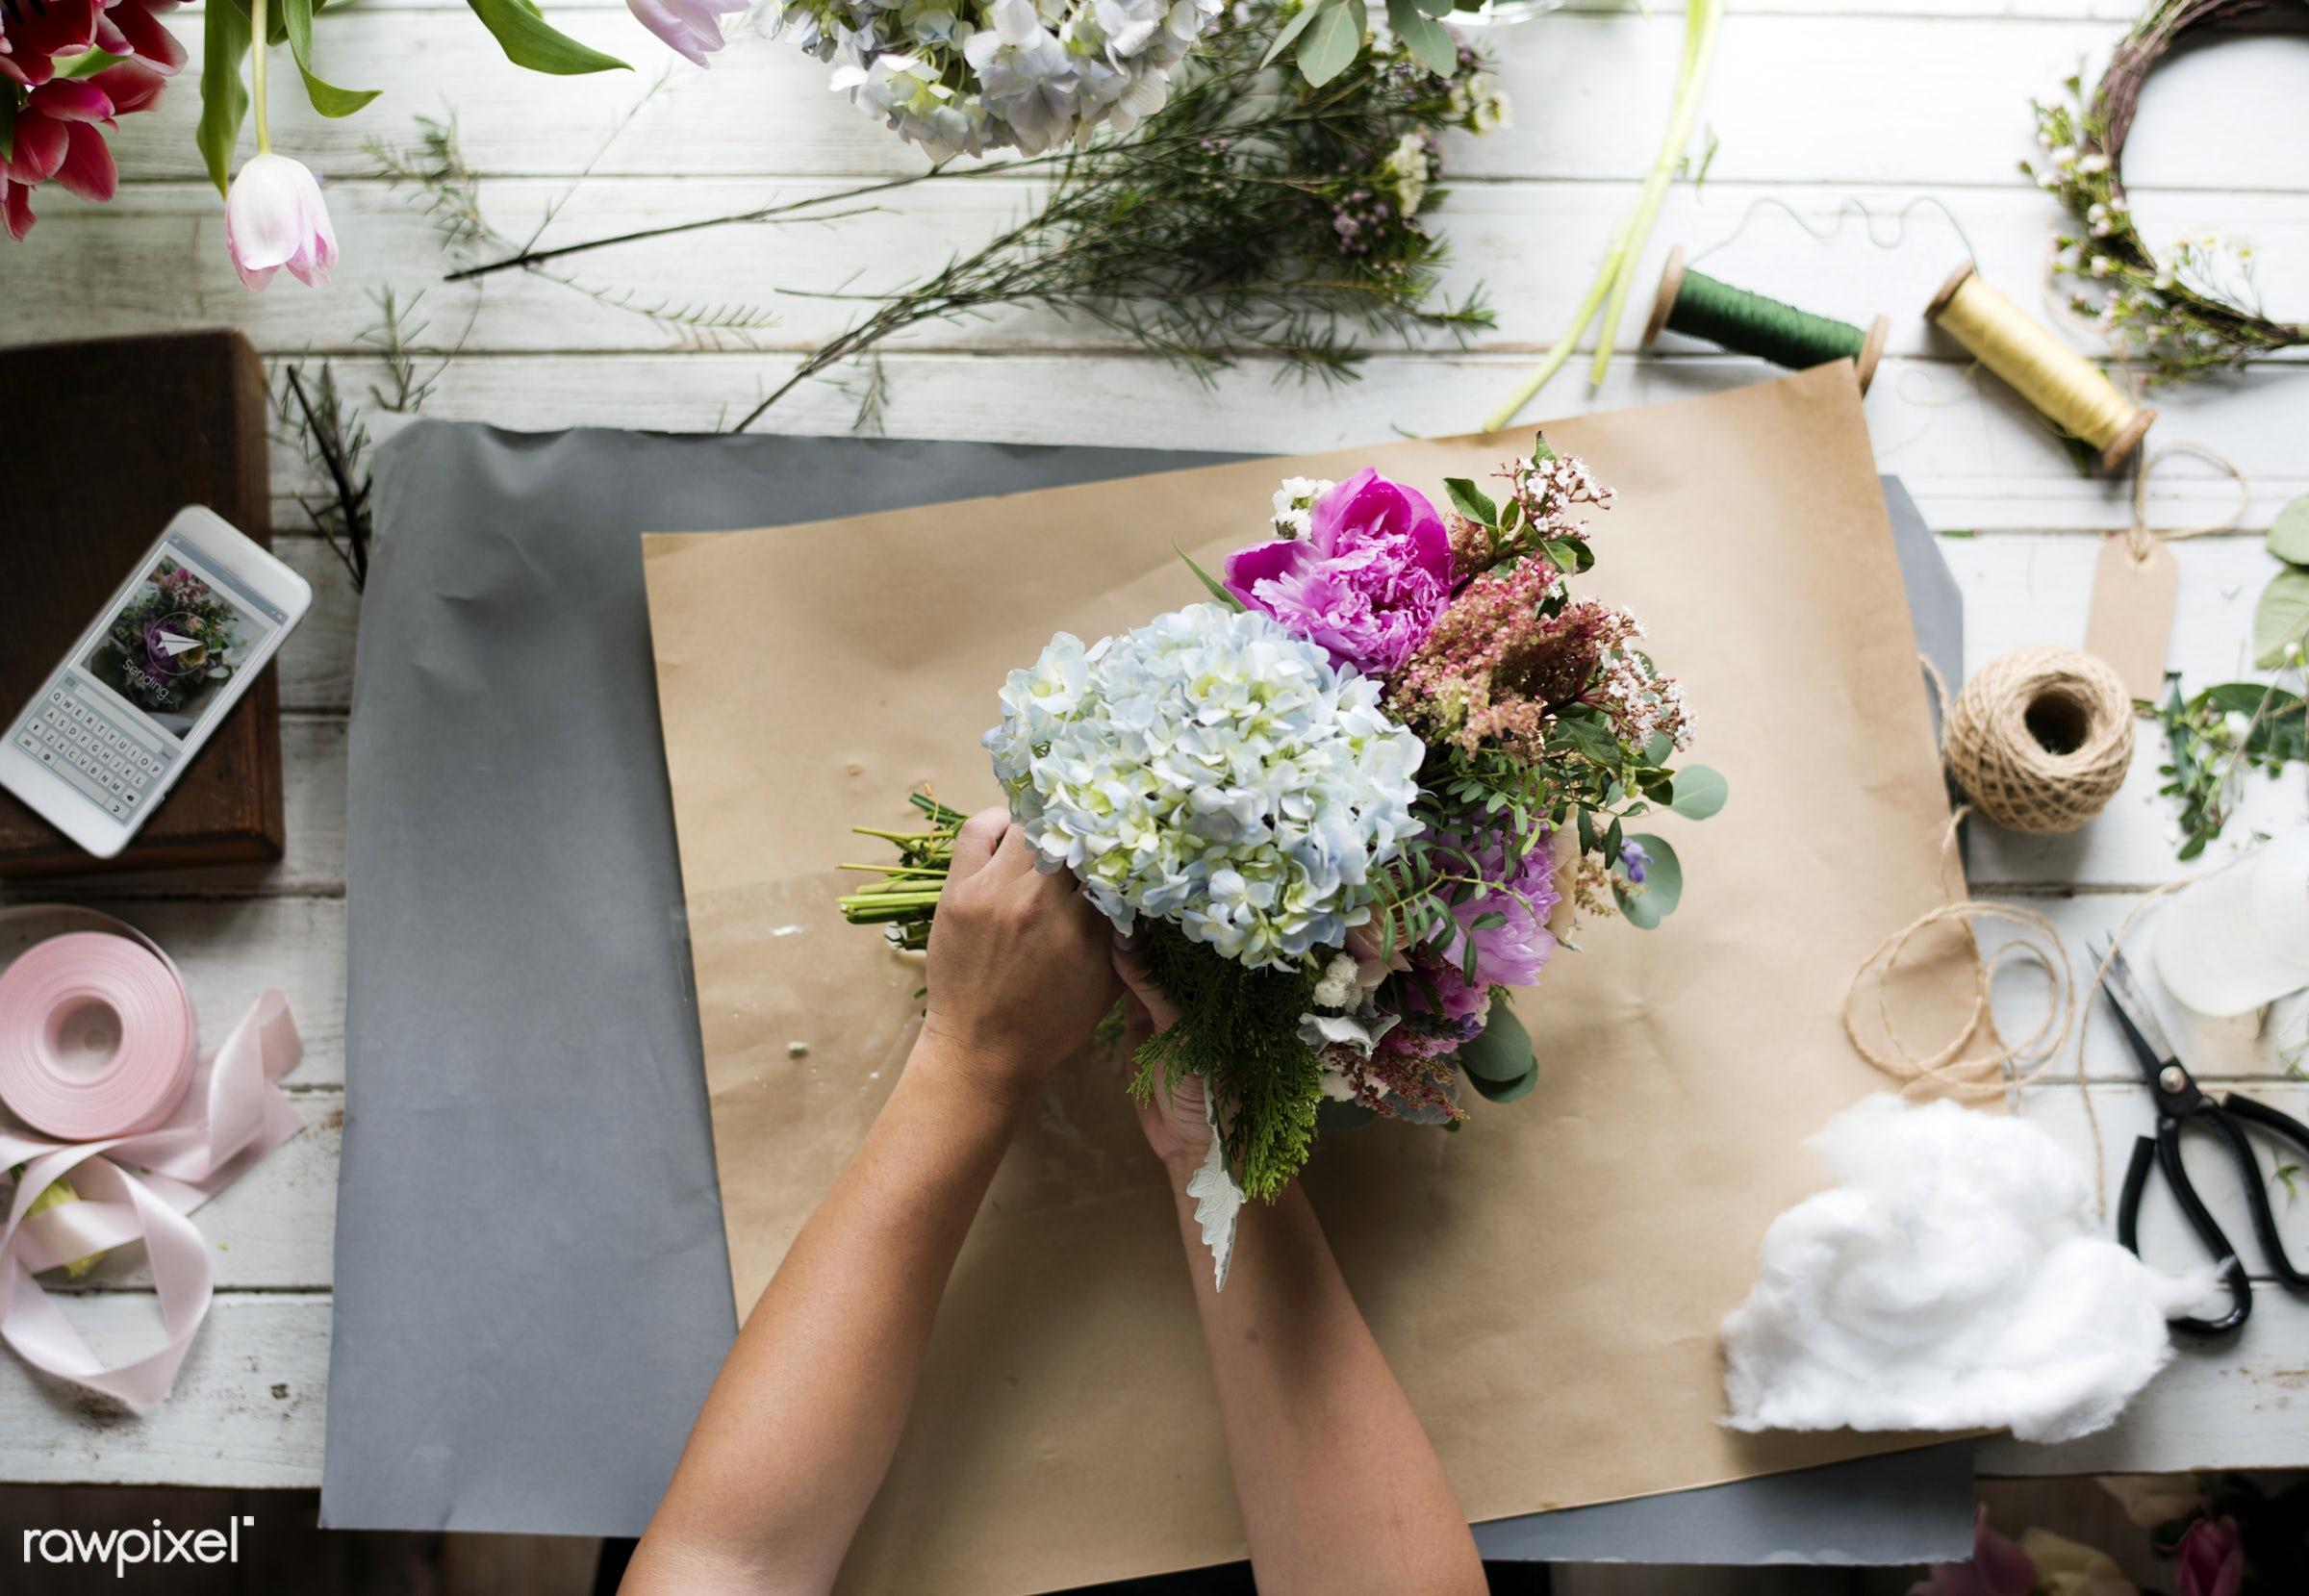 Florist job flower arrangement - flowers, florist, job, occupation, arrangement, decoration, real, fresh, art, skill,...